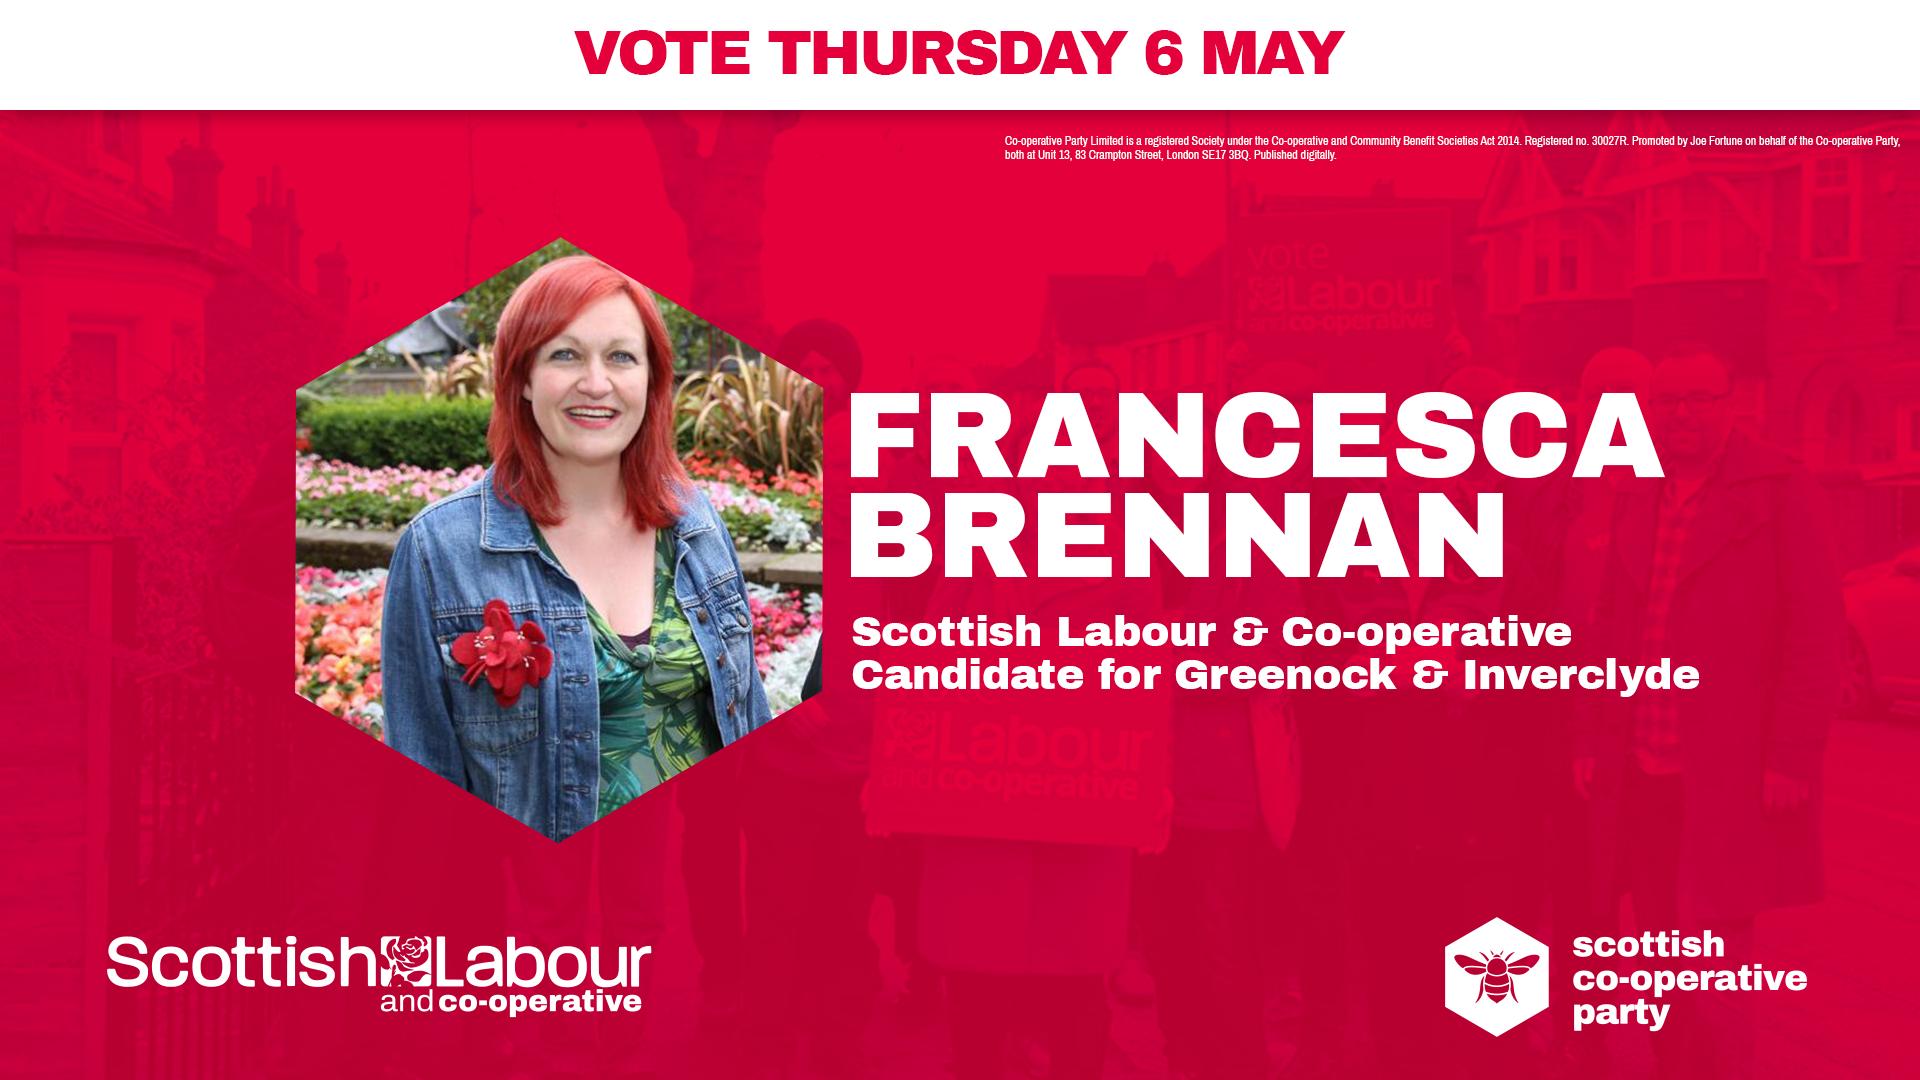 Francesca Brennan